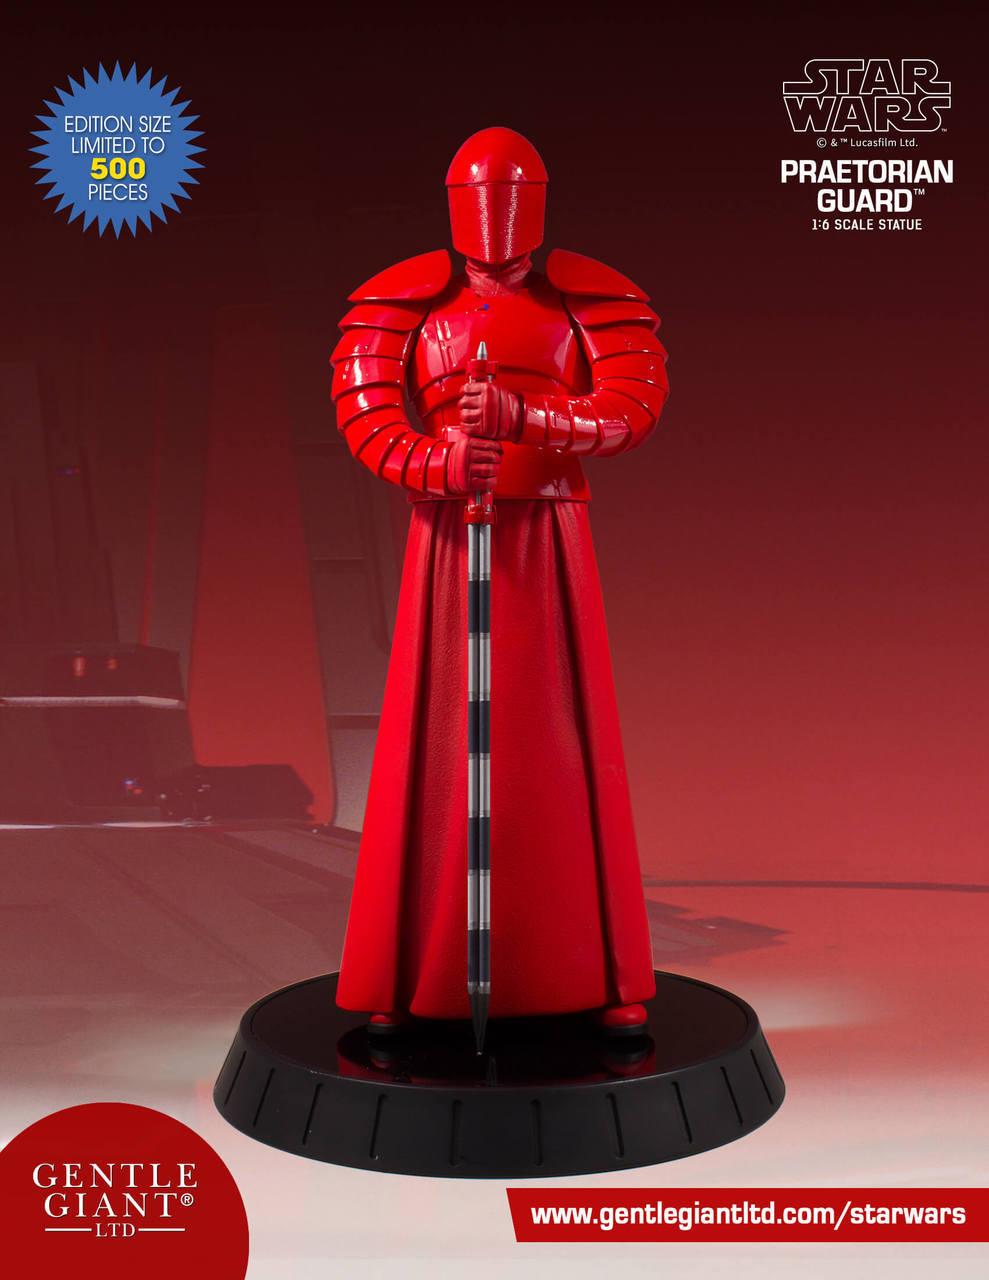 Gentle Giant Praetorian Guard Statue 1